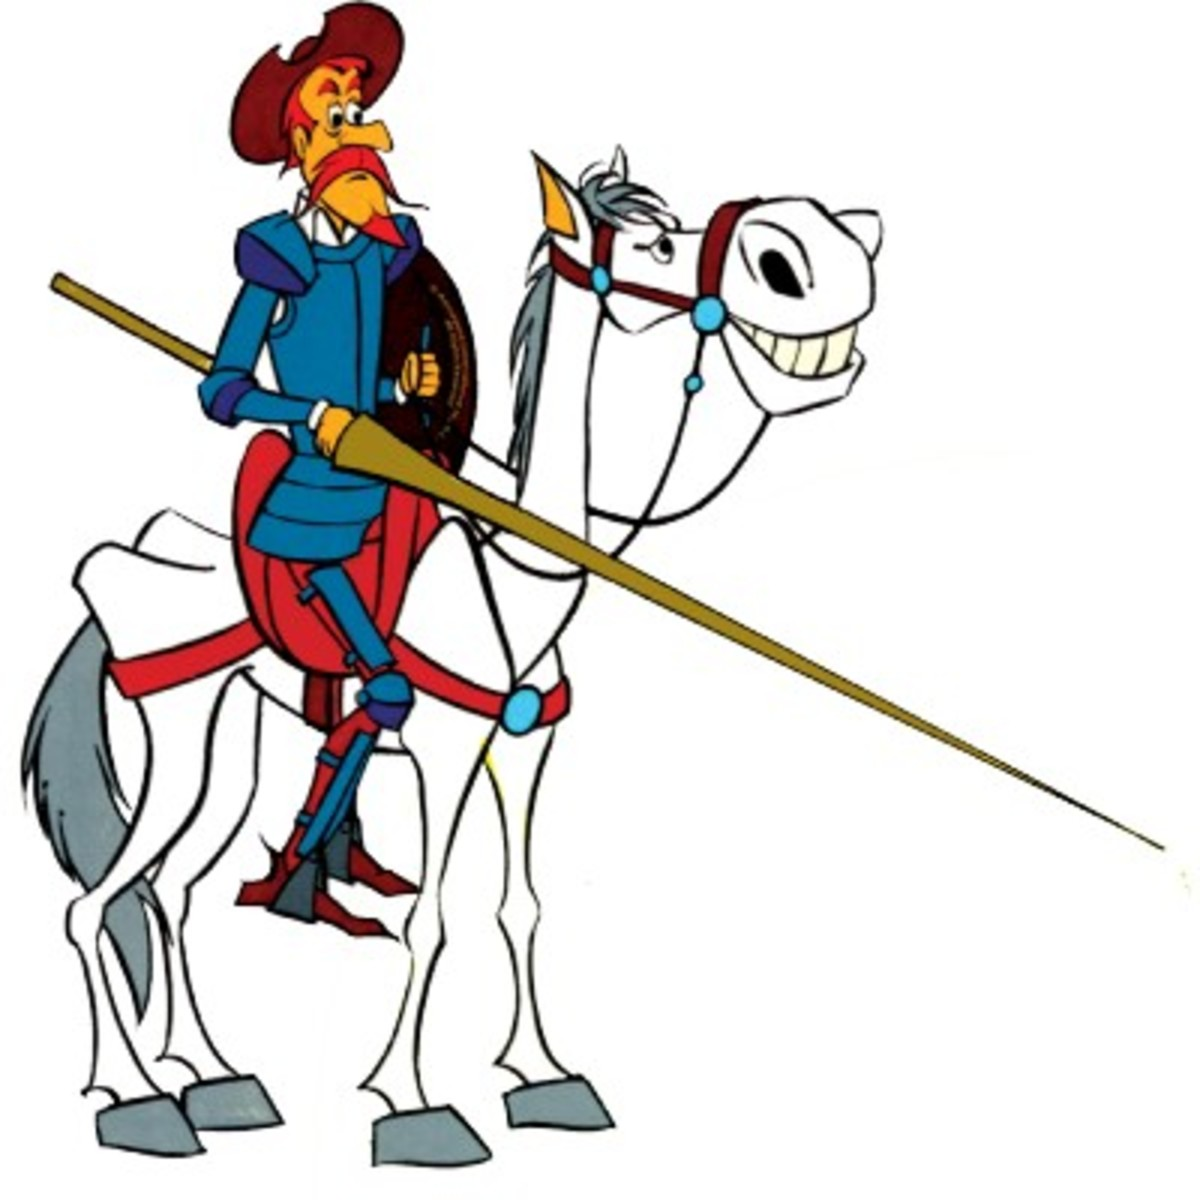 Don Quixote and his steed  Rocinante